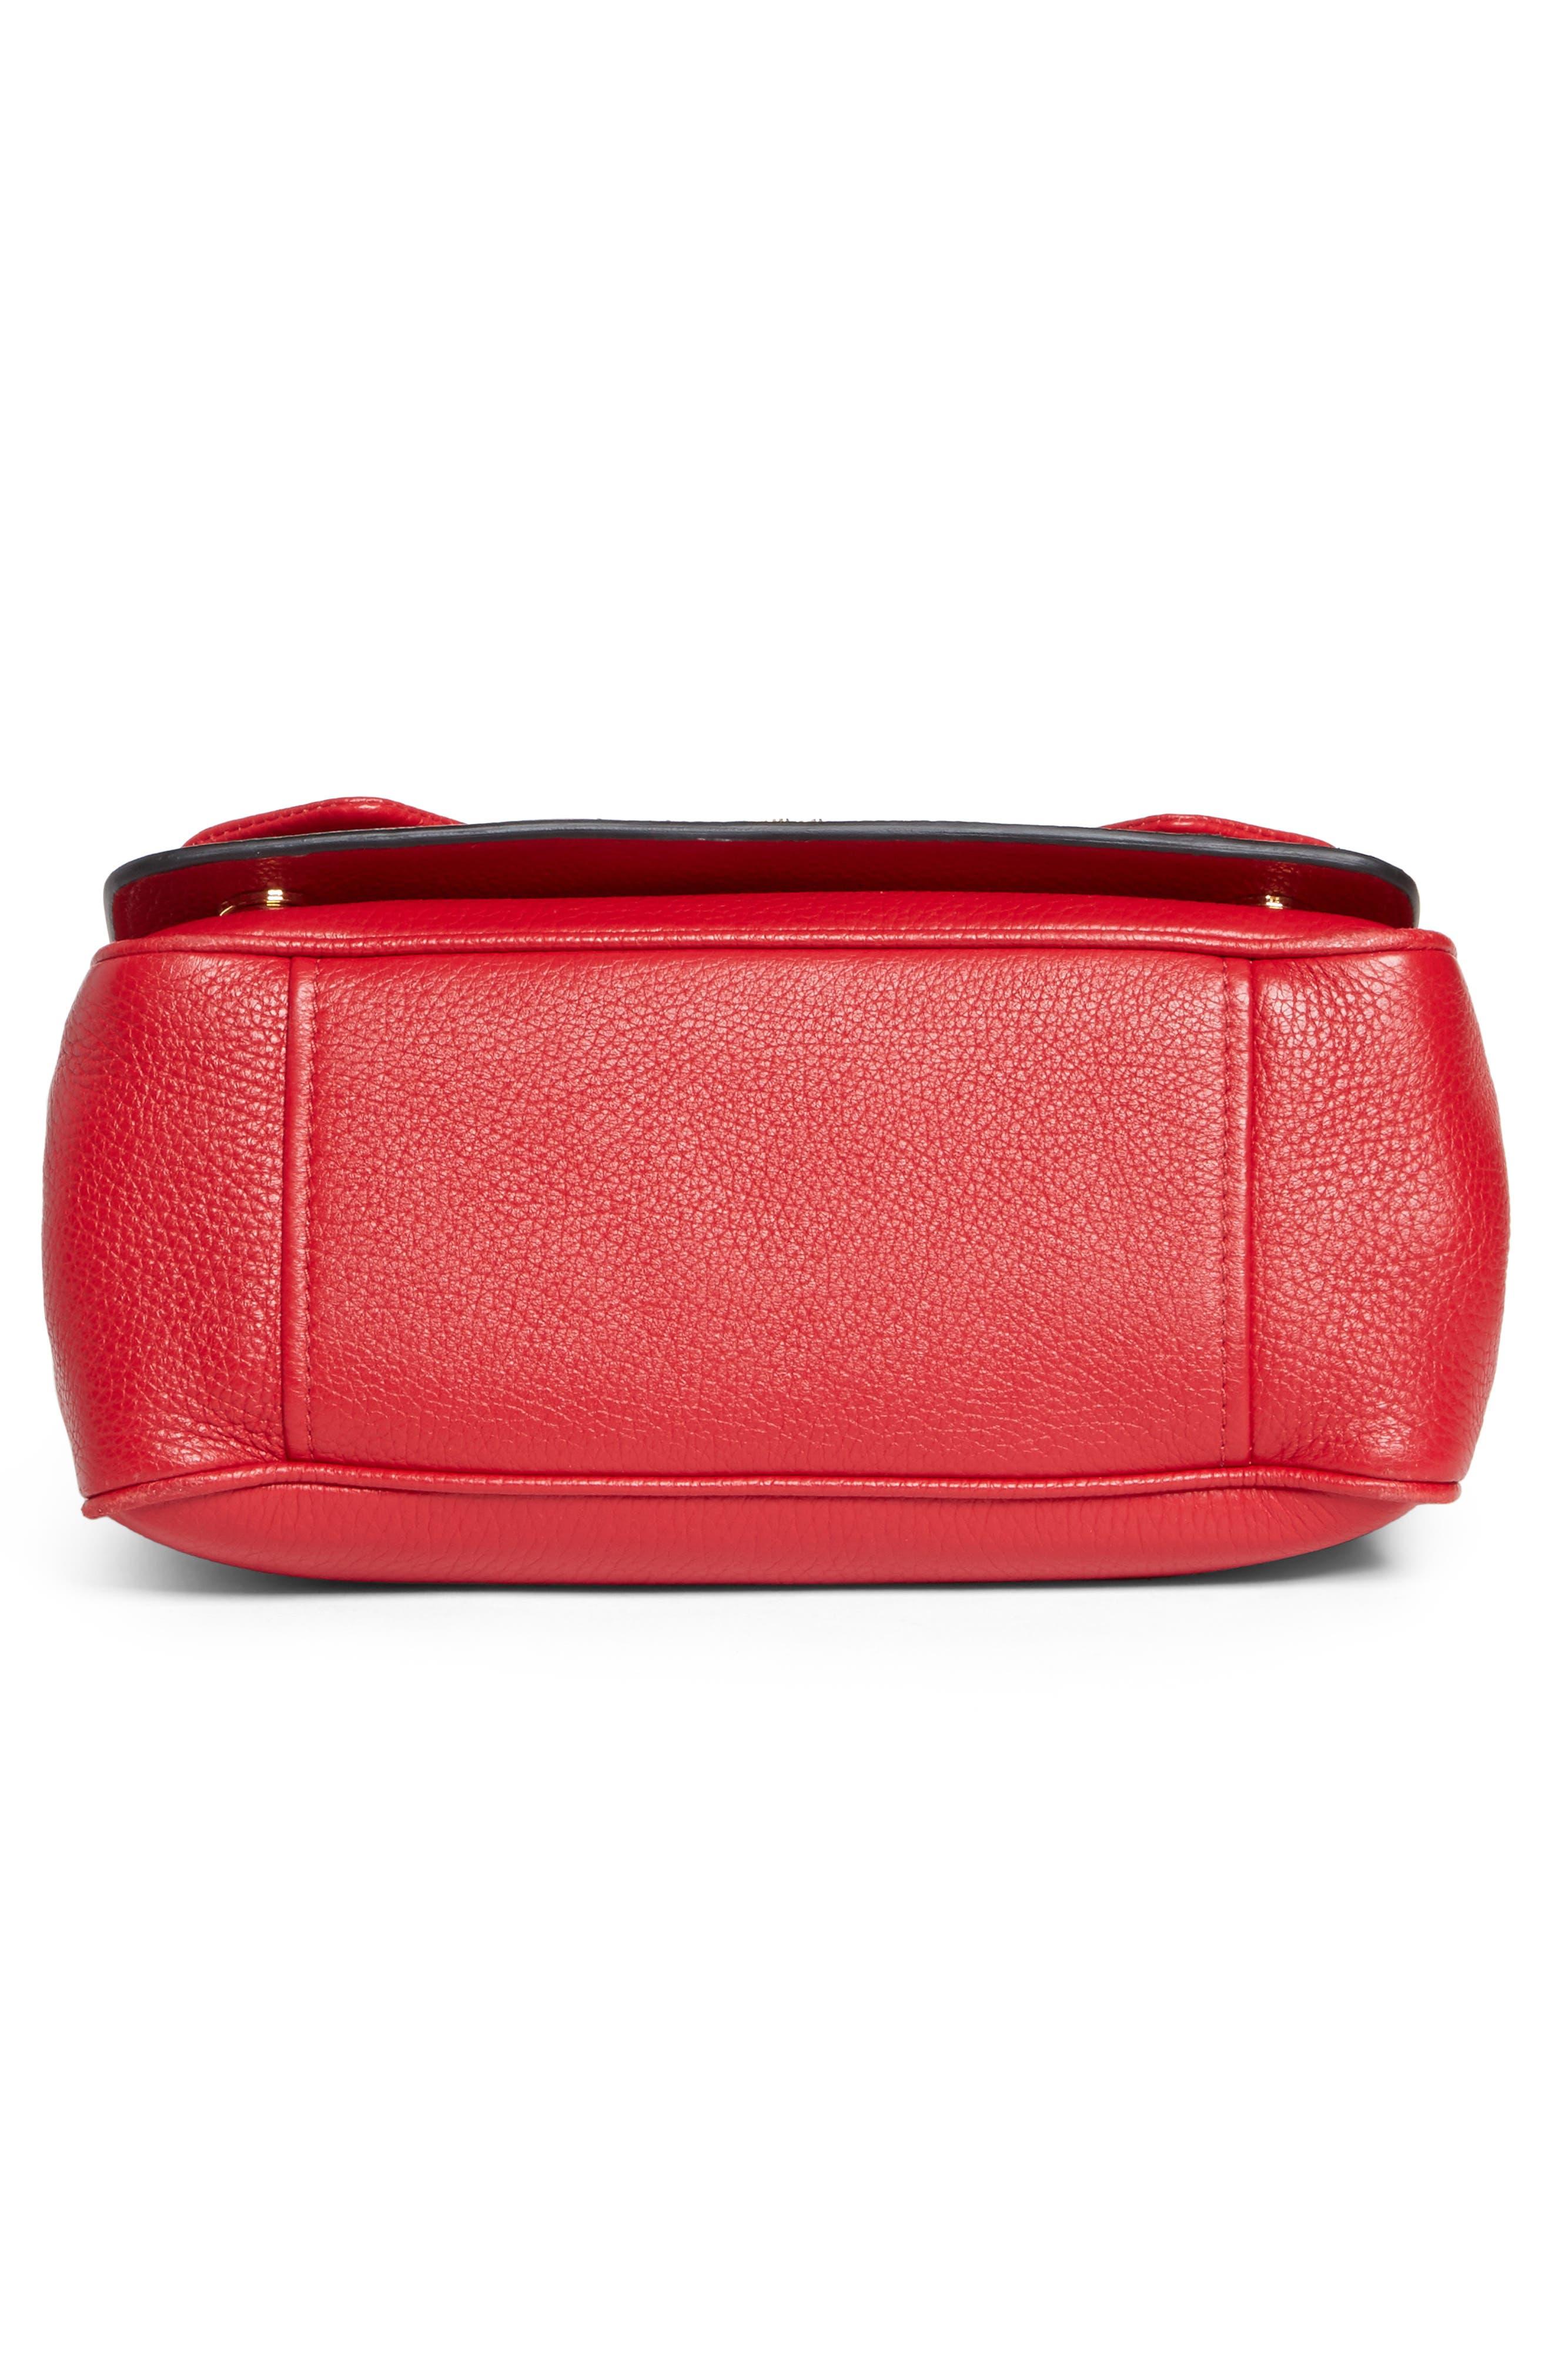 Grainy-B Leather Crossbody Bag,                             Alternate thumbnail 6, color,                             Red